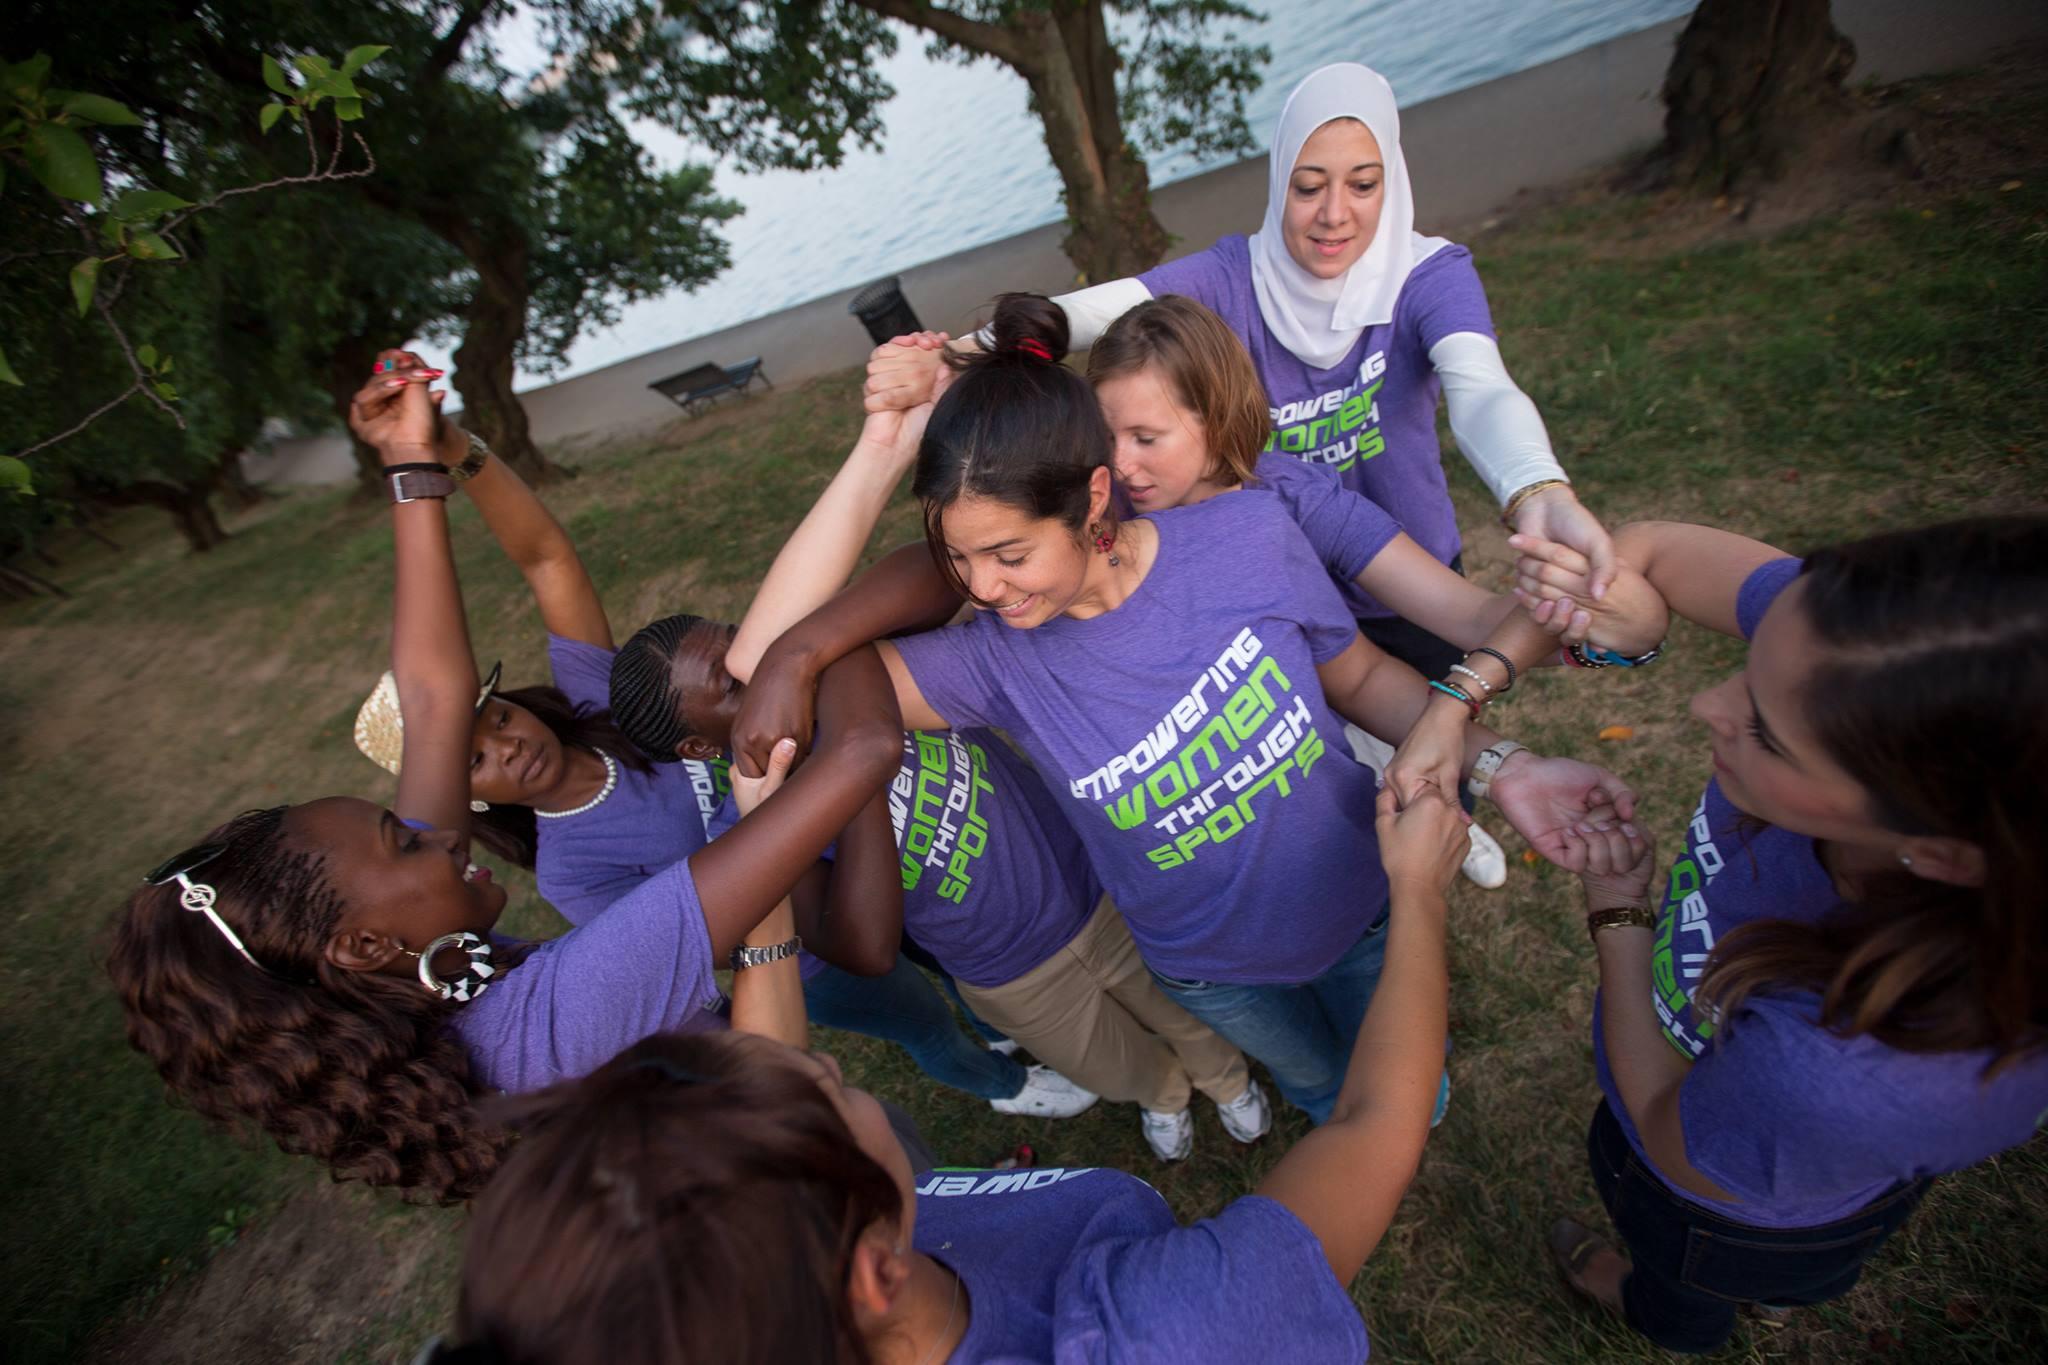 Empowering women and girls through sports.